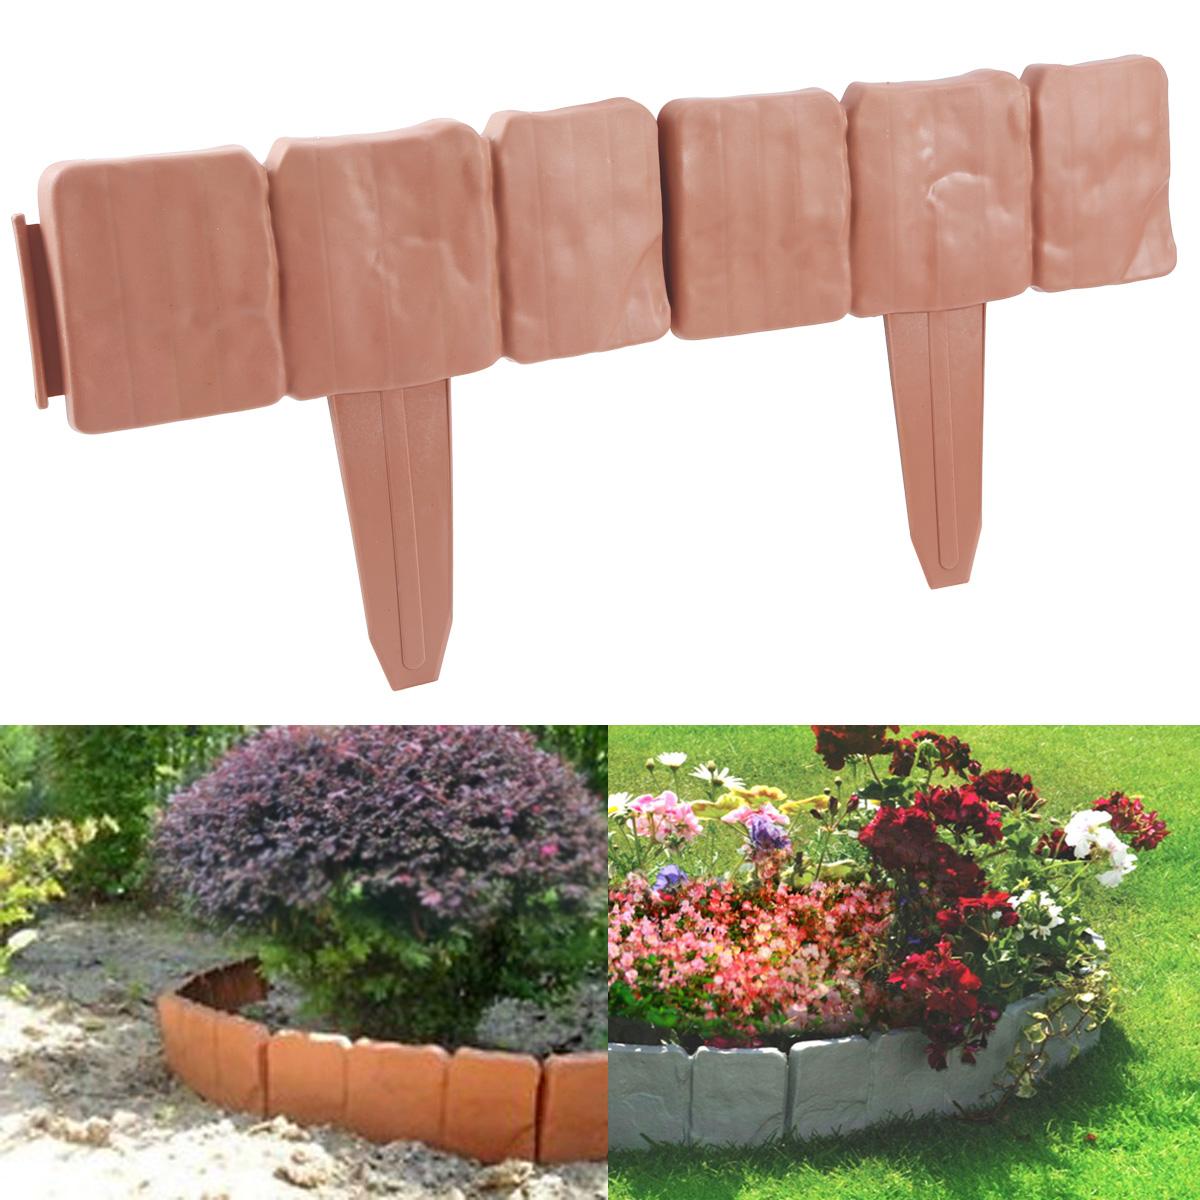 Garden Border Lawn Edging Flexible Plastic Flower Bed